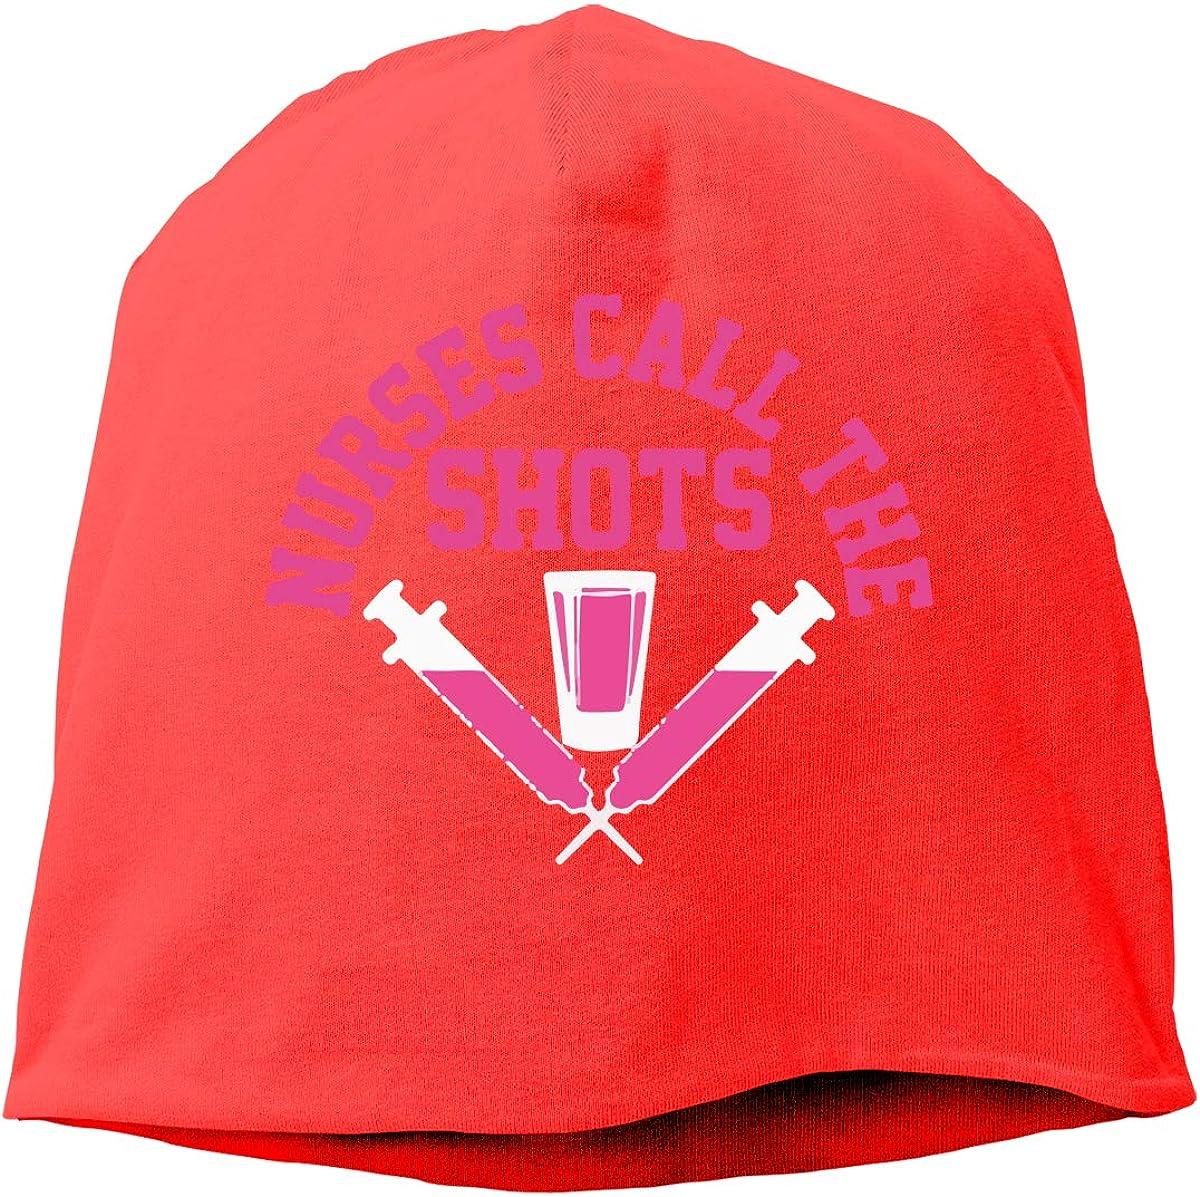 Nurses Call The Shot Beanie Skull Cap for Women and Men Winter Warm Knit Hat